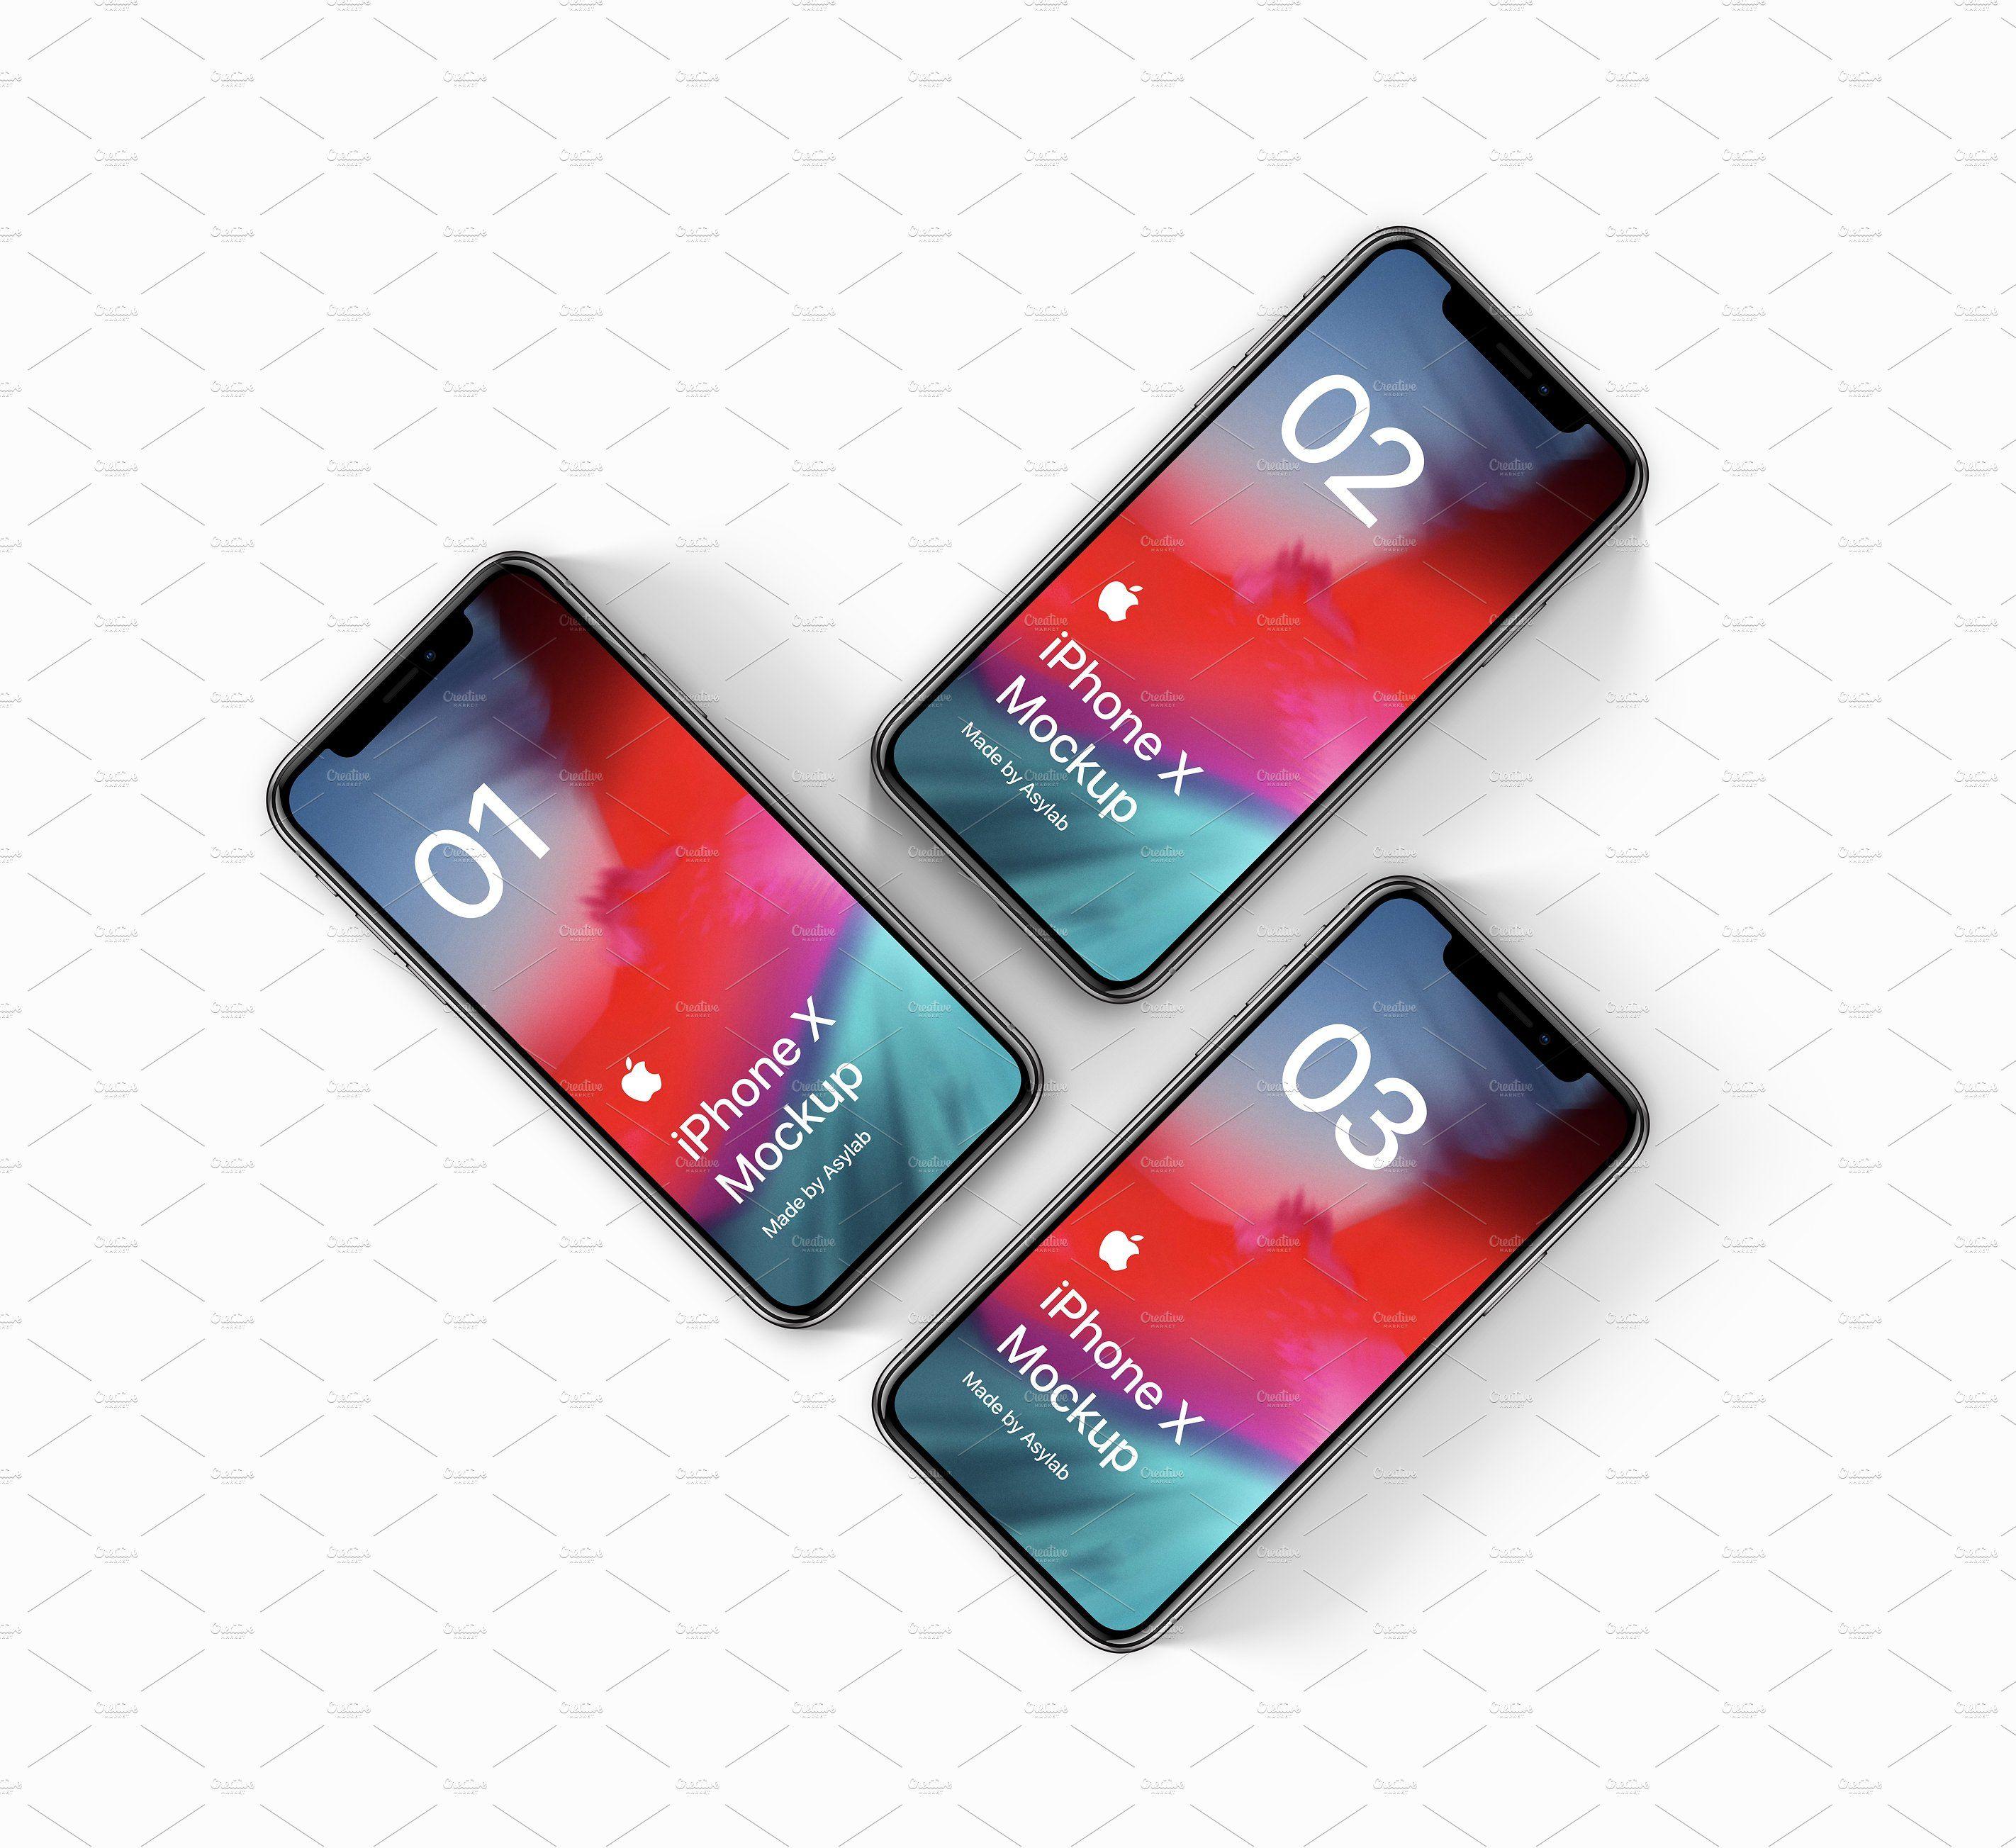 Phone X 16 Mockups Iphone mockup, Mockup, Iphone